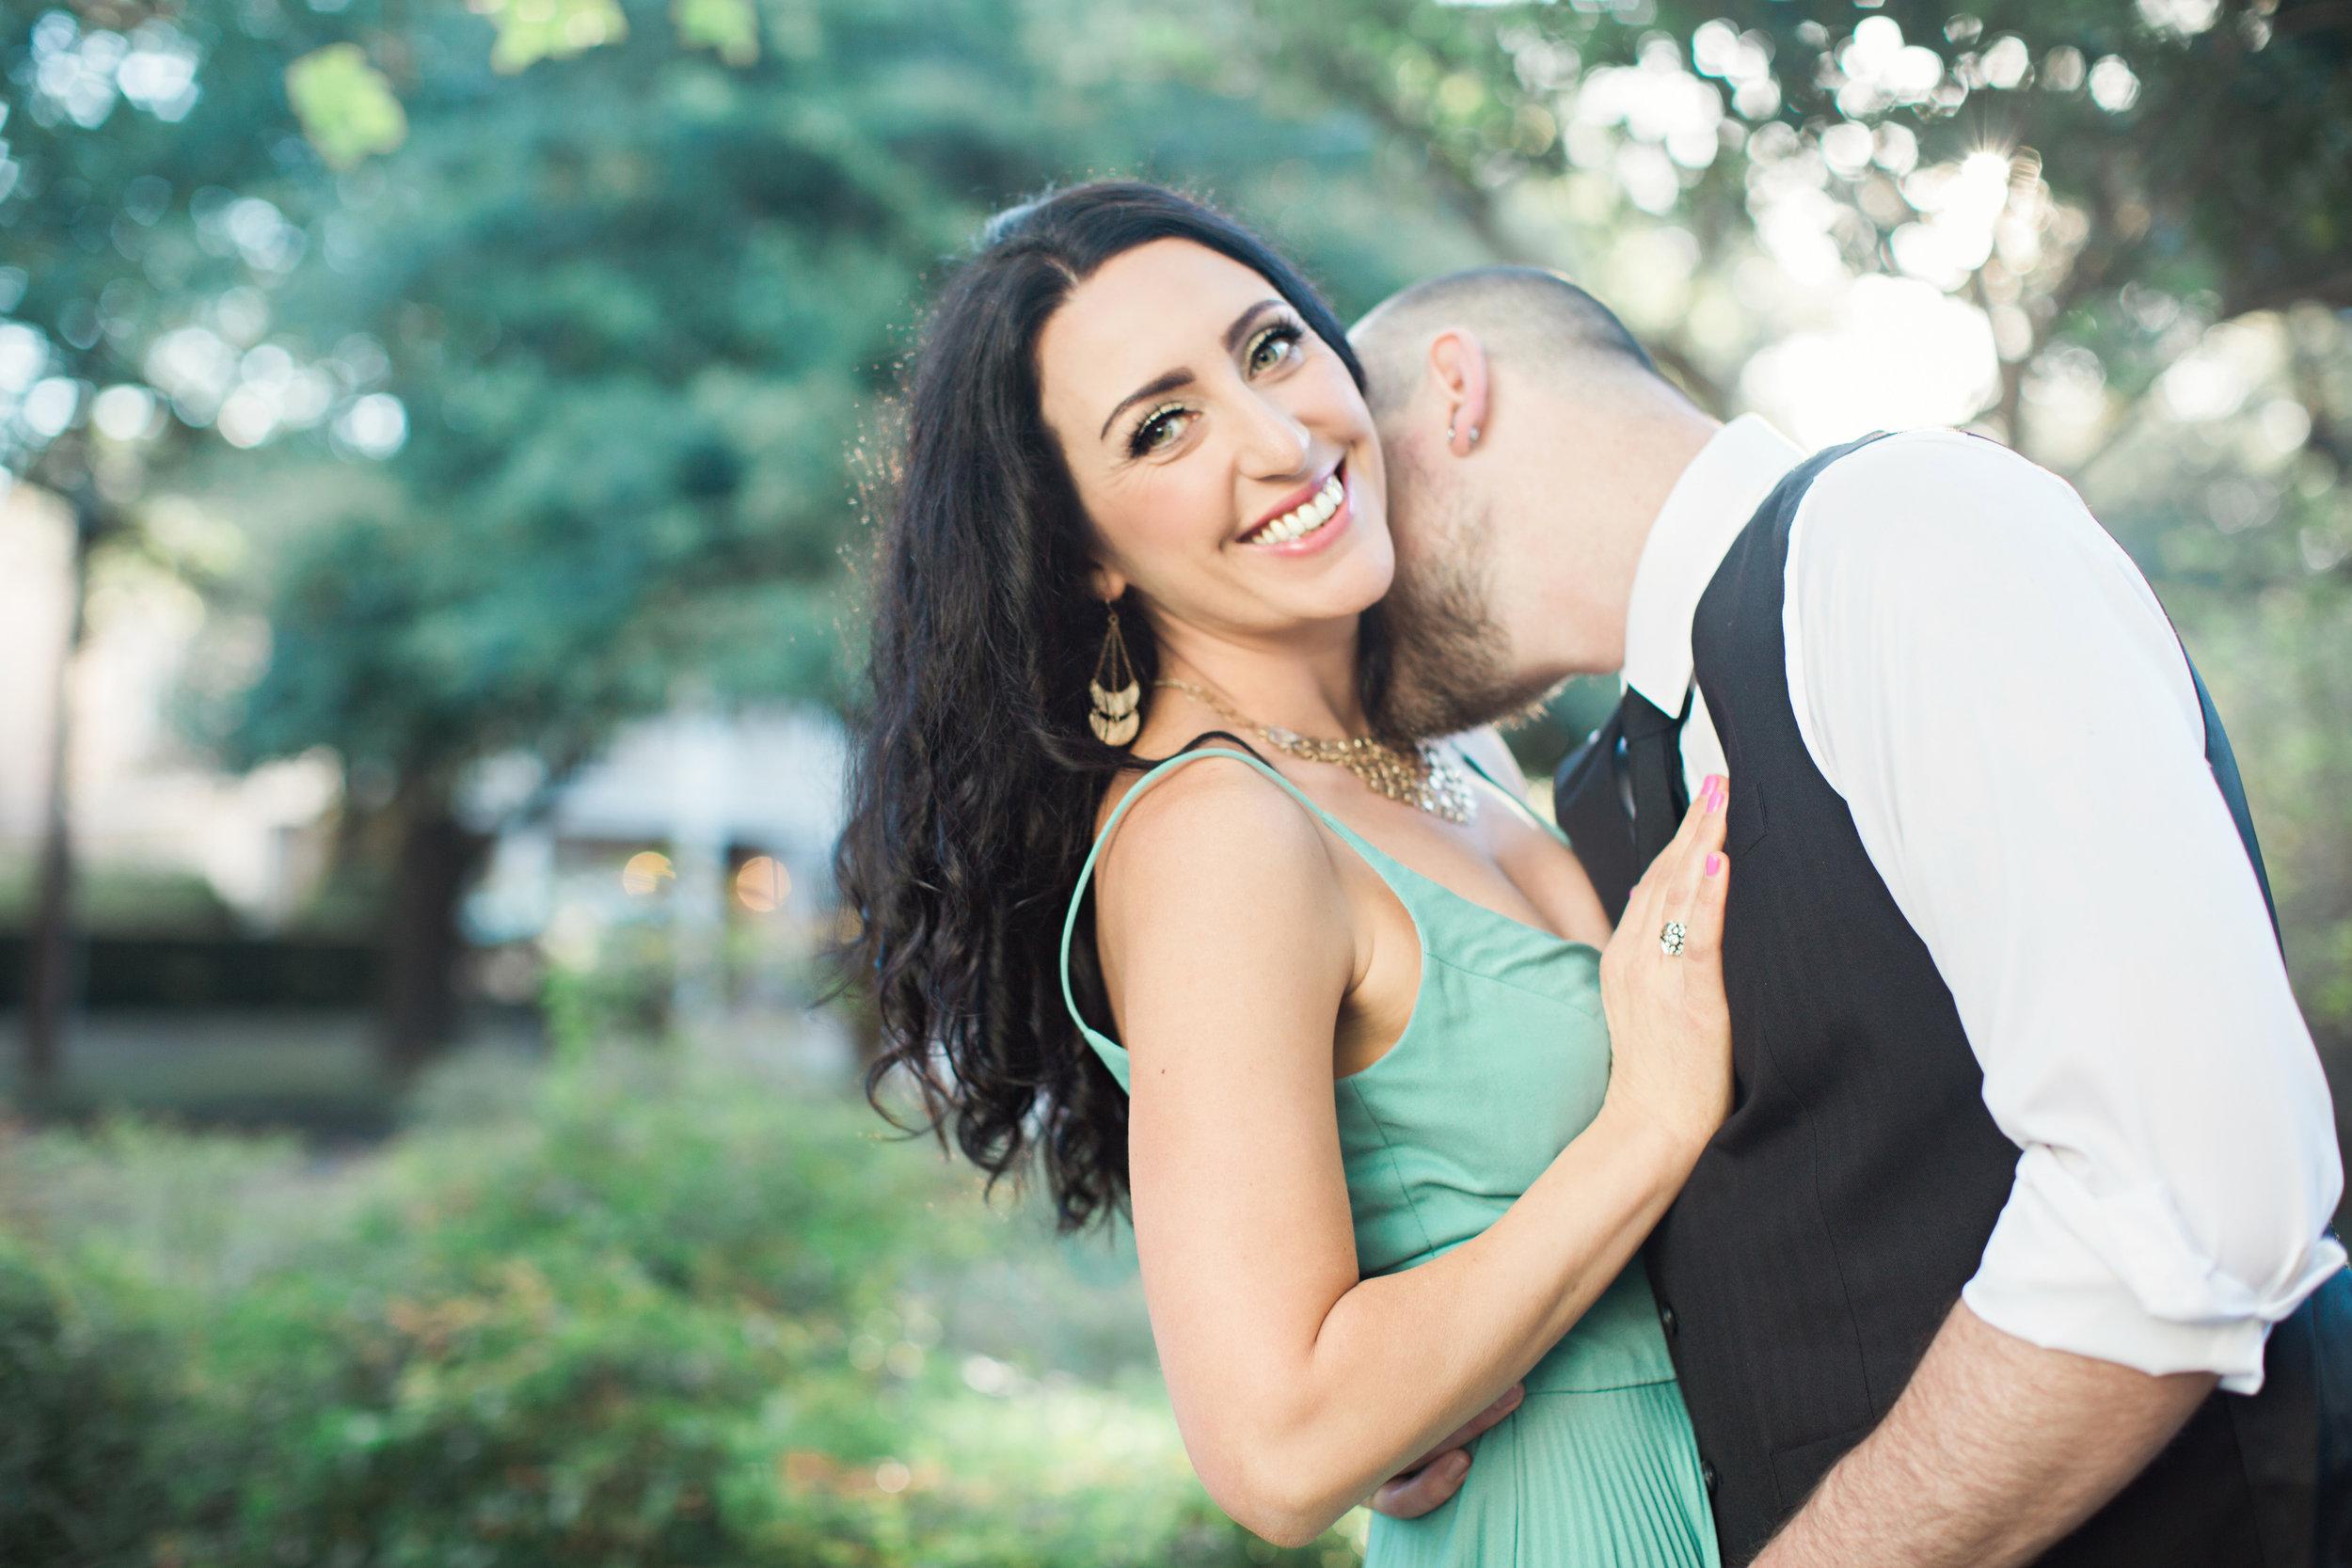 CindyGiovagnoliPhotography_Seattle_Washington_PNW_Couple_Engagement_Portrait_Photography-009.jpg